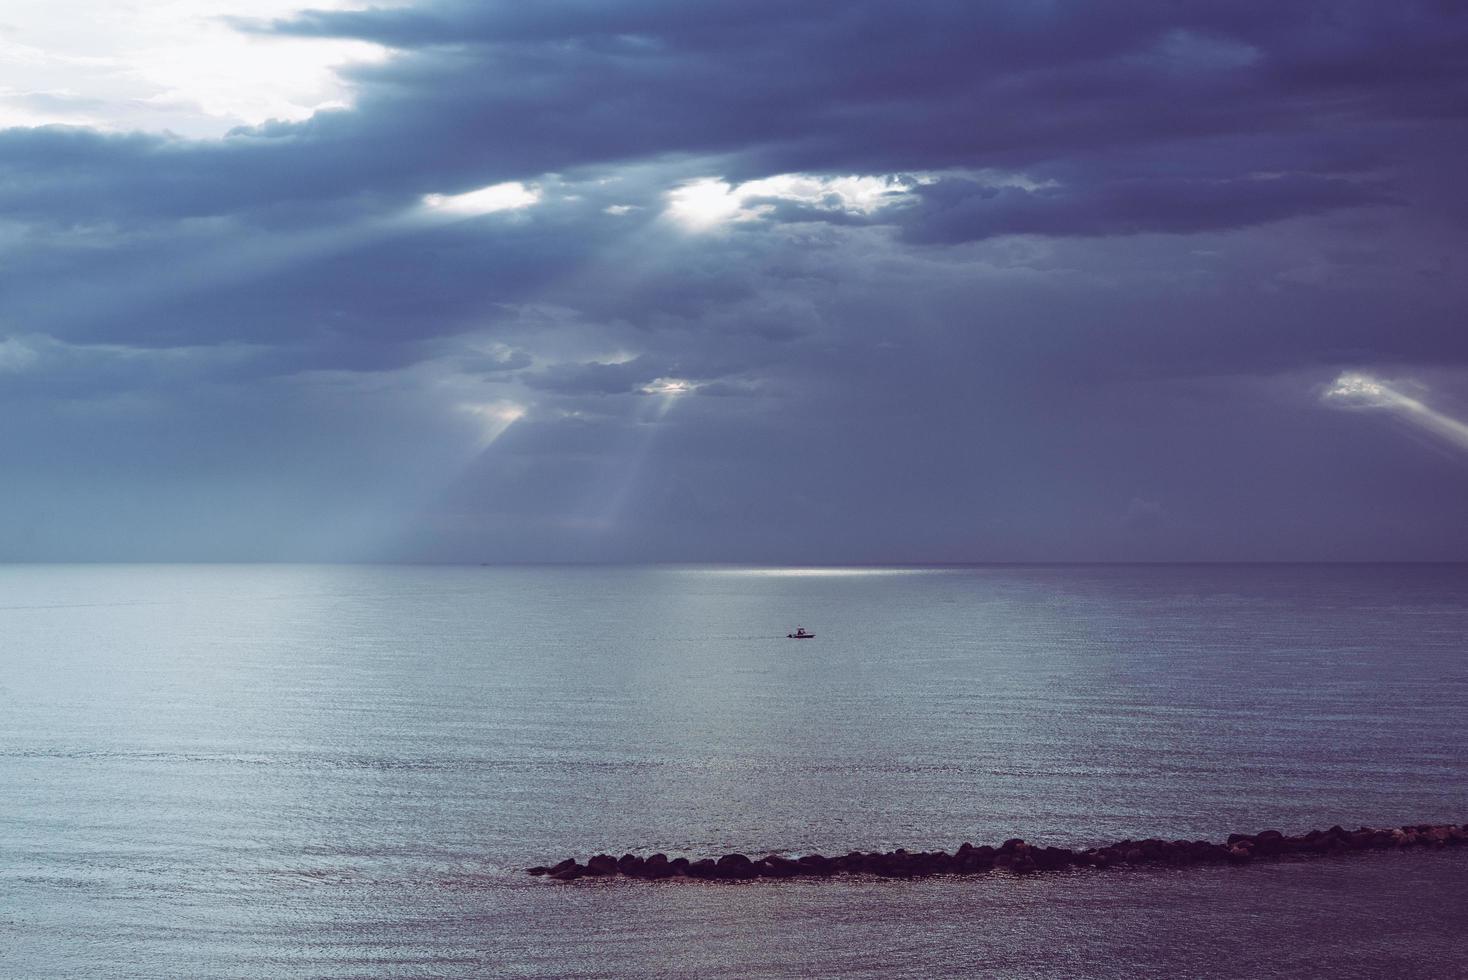 Ozean mit bewölktem Himmel foto